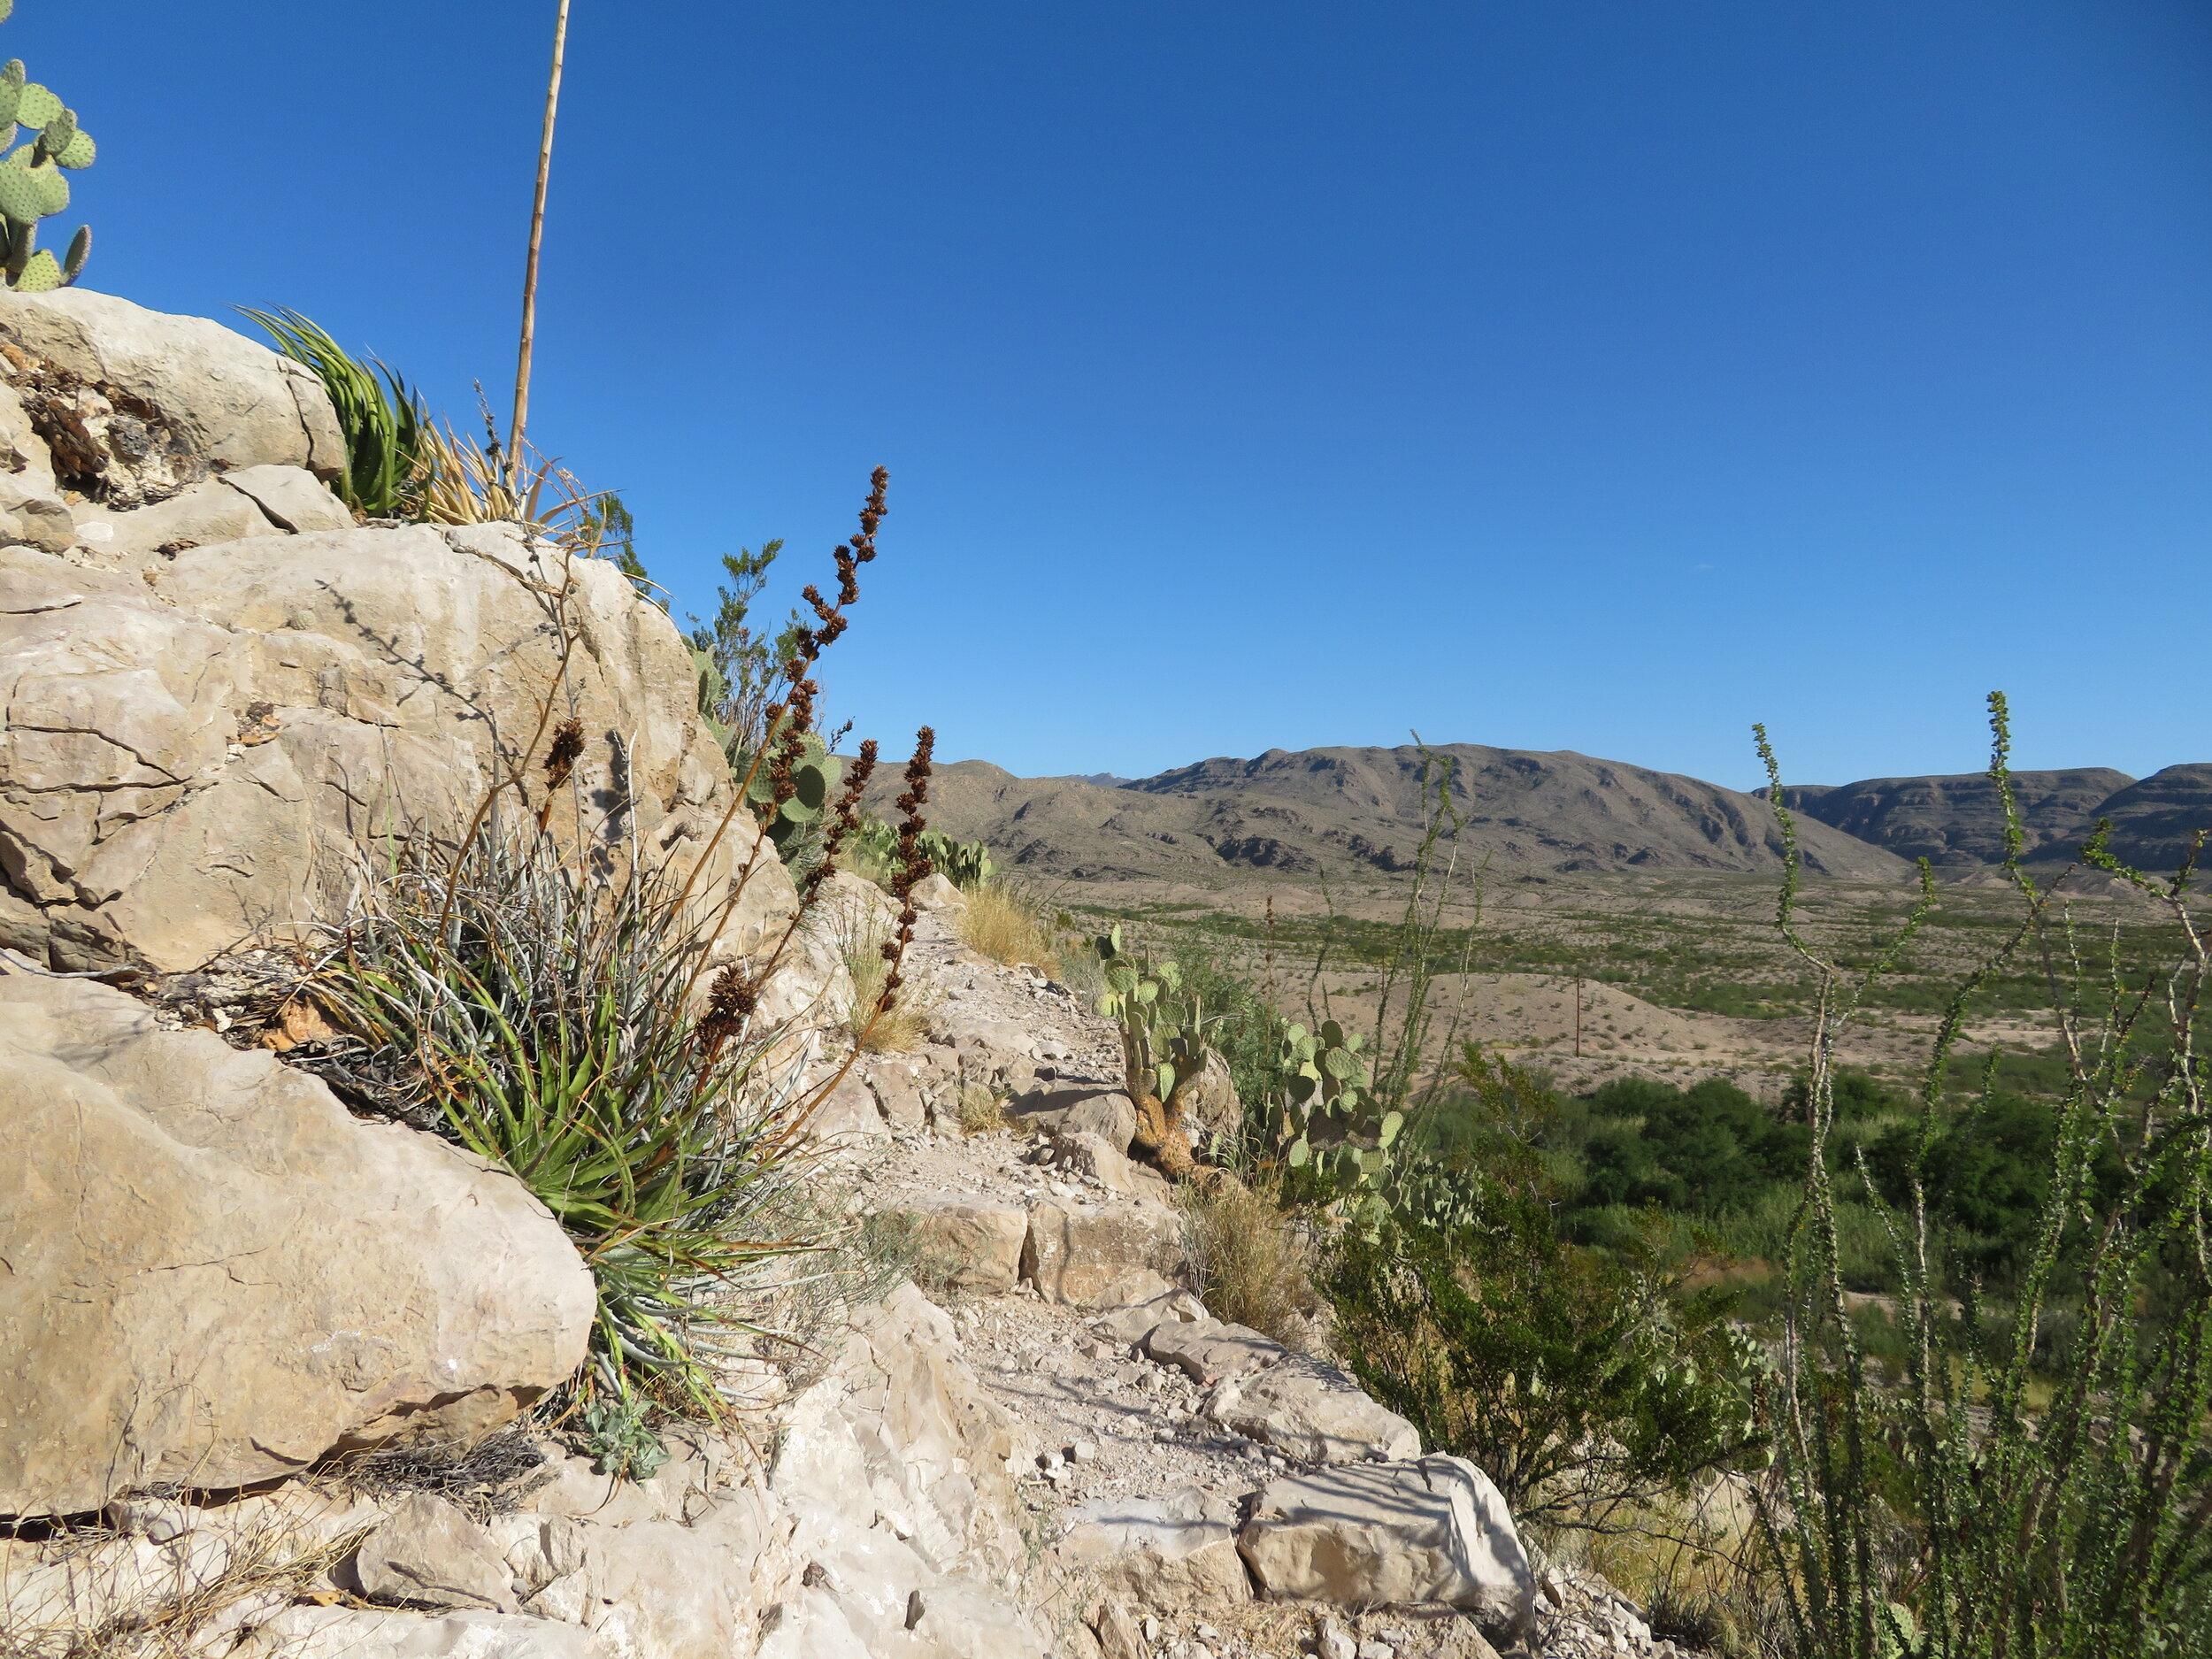 A rocky, rugged trail